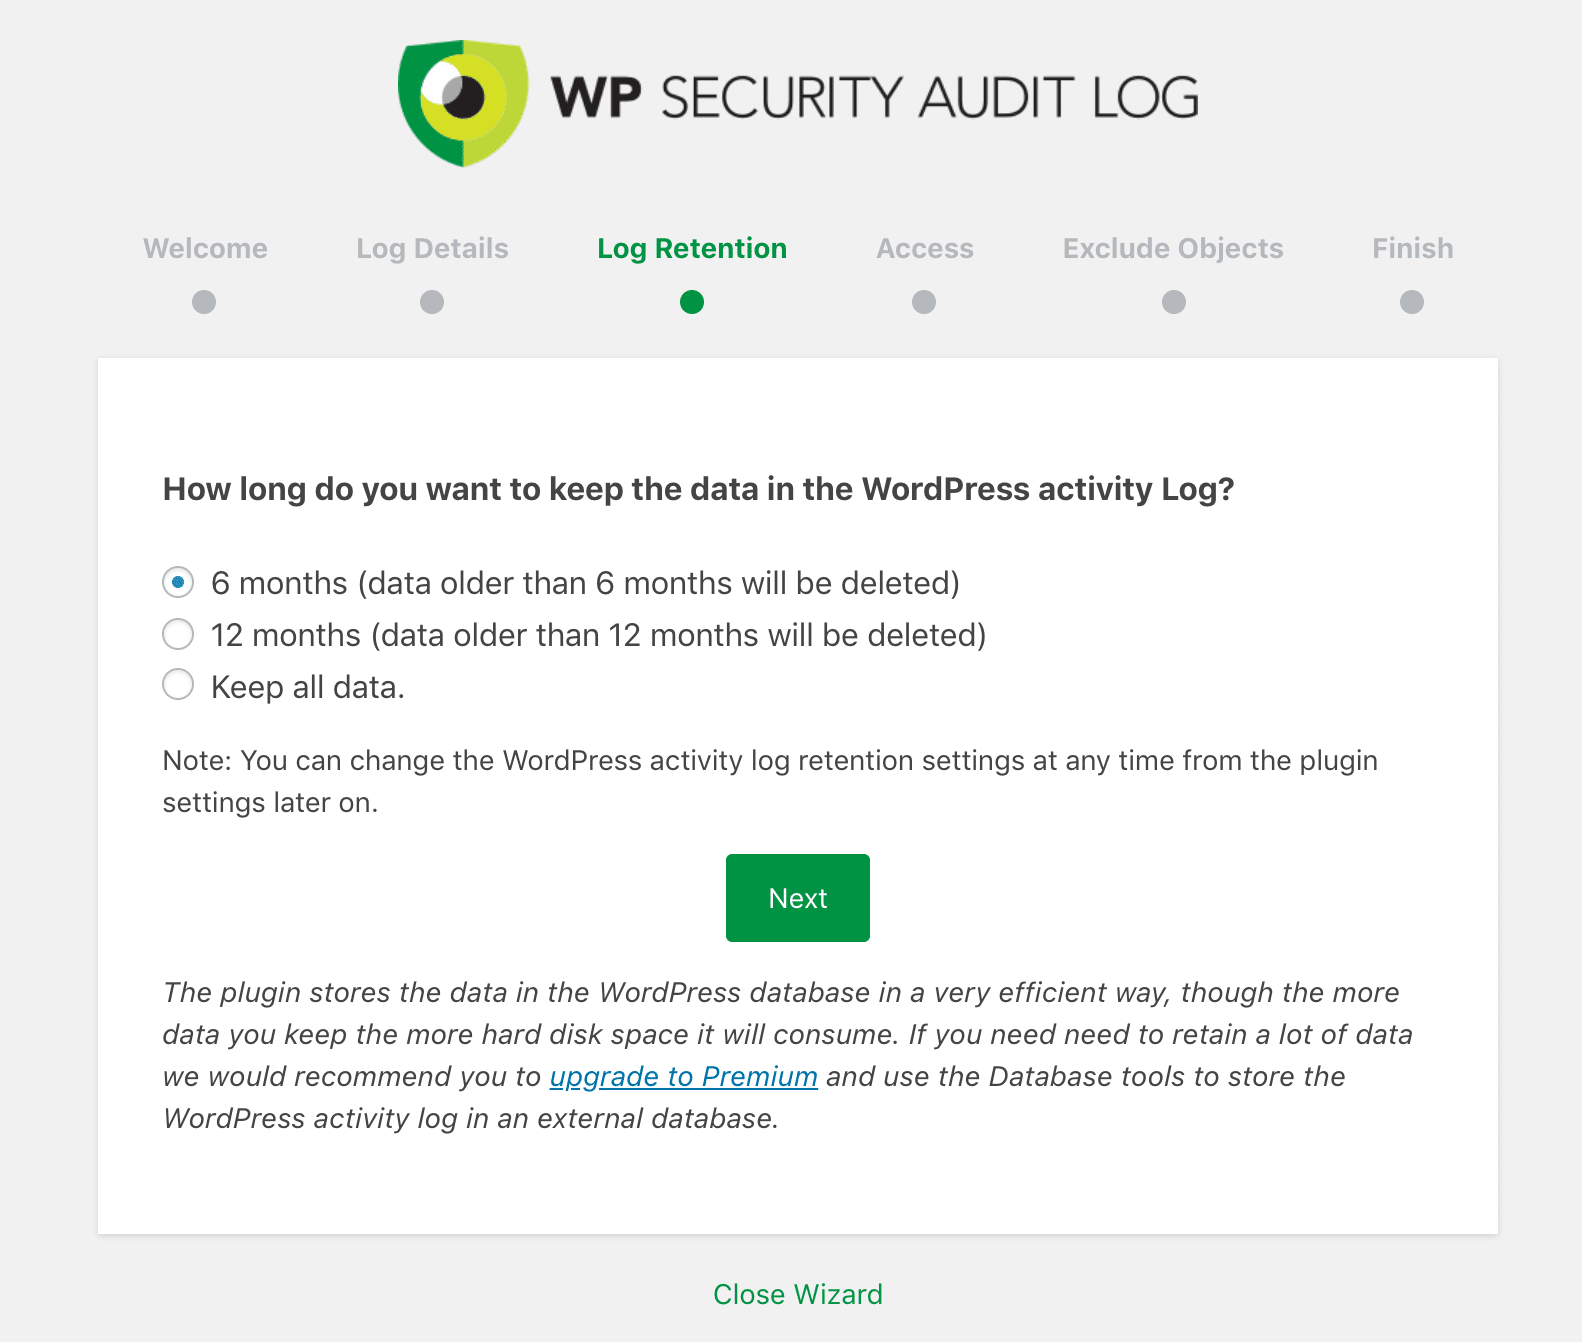 WP Security Audit Log Datenaufbewahrung